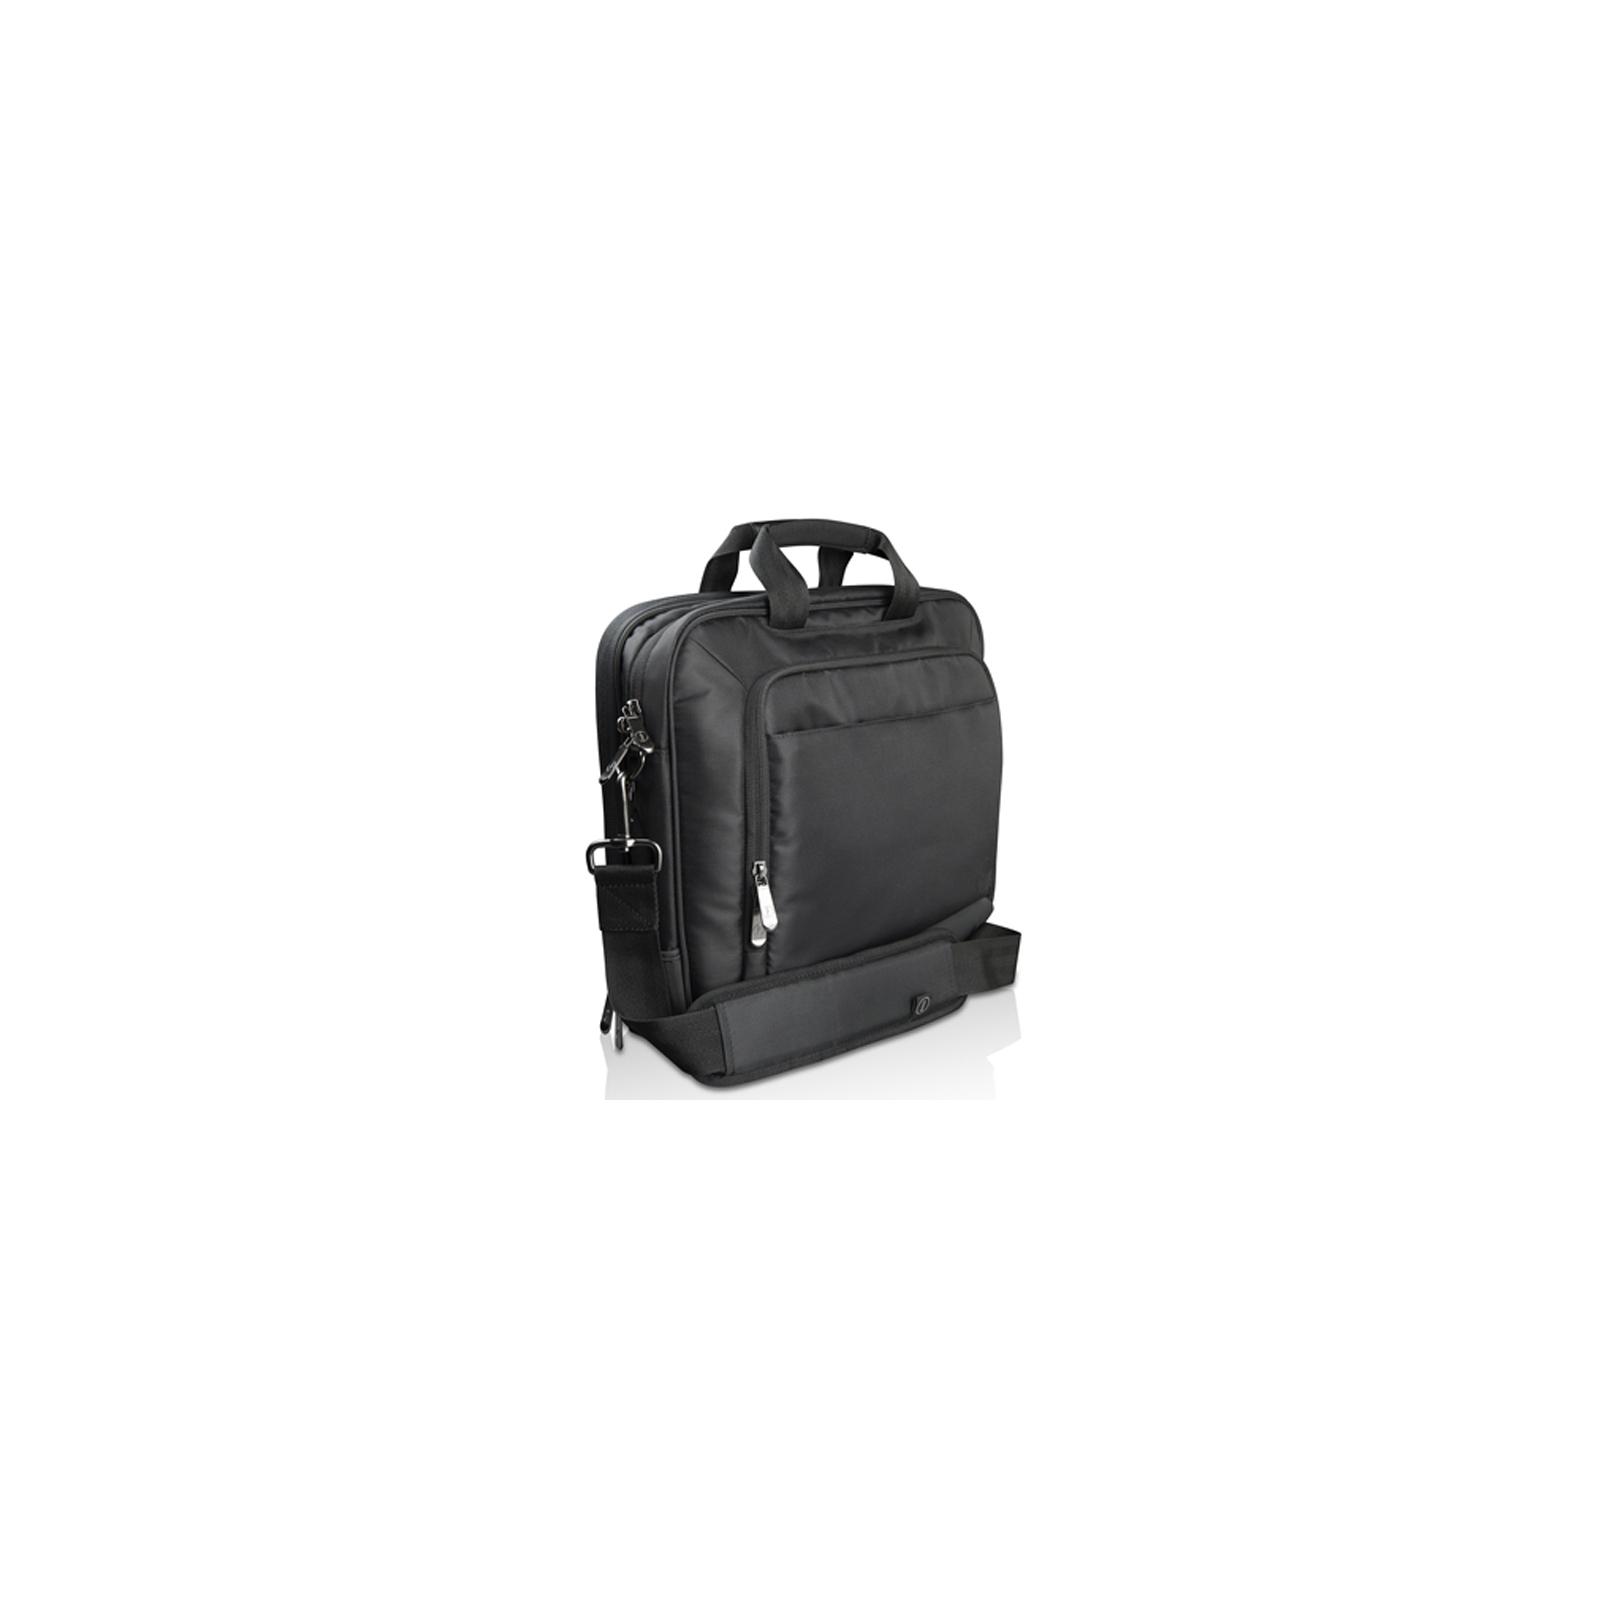 "Сумка для ноутбука Dell 15.6"" Topload (460-BBLR) изображение 4"